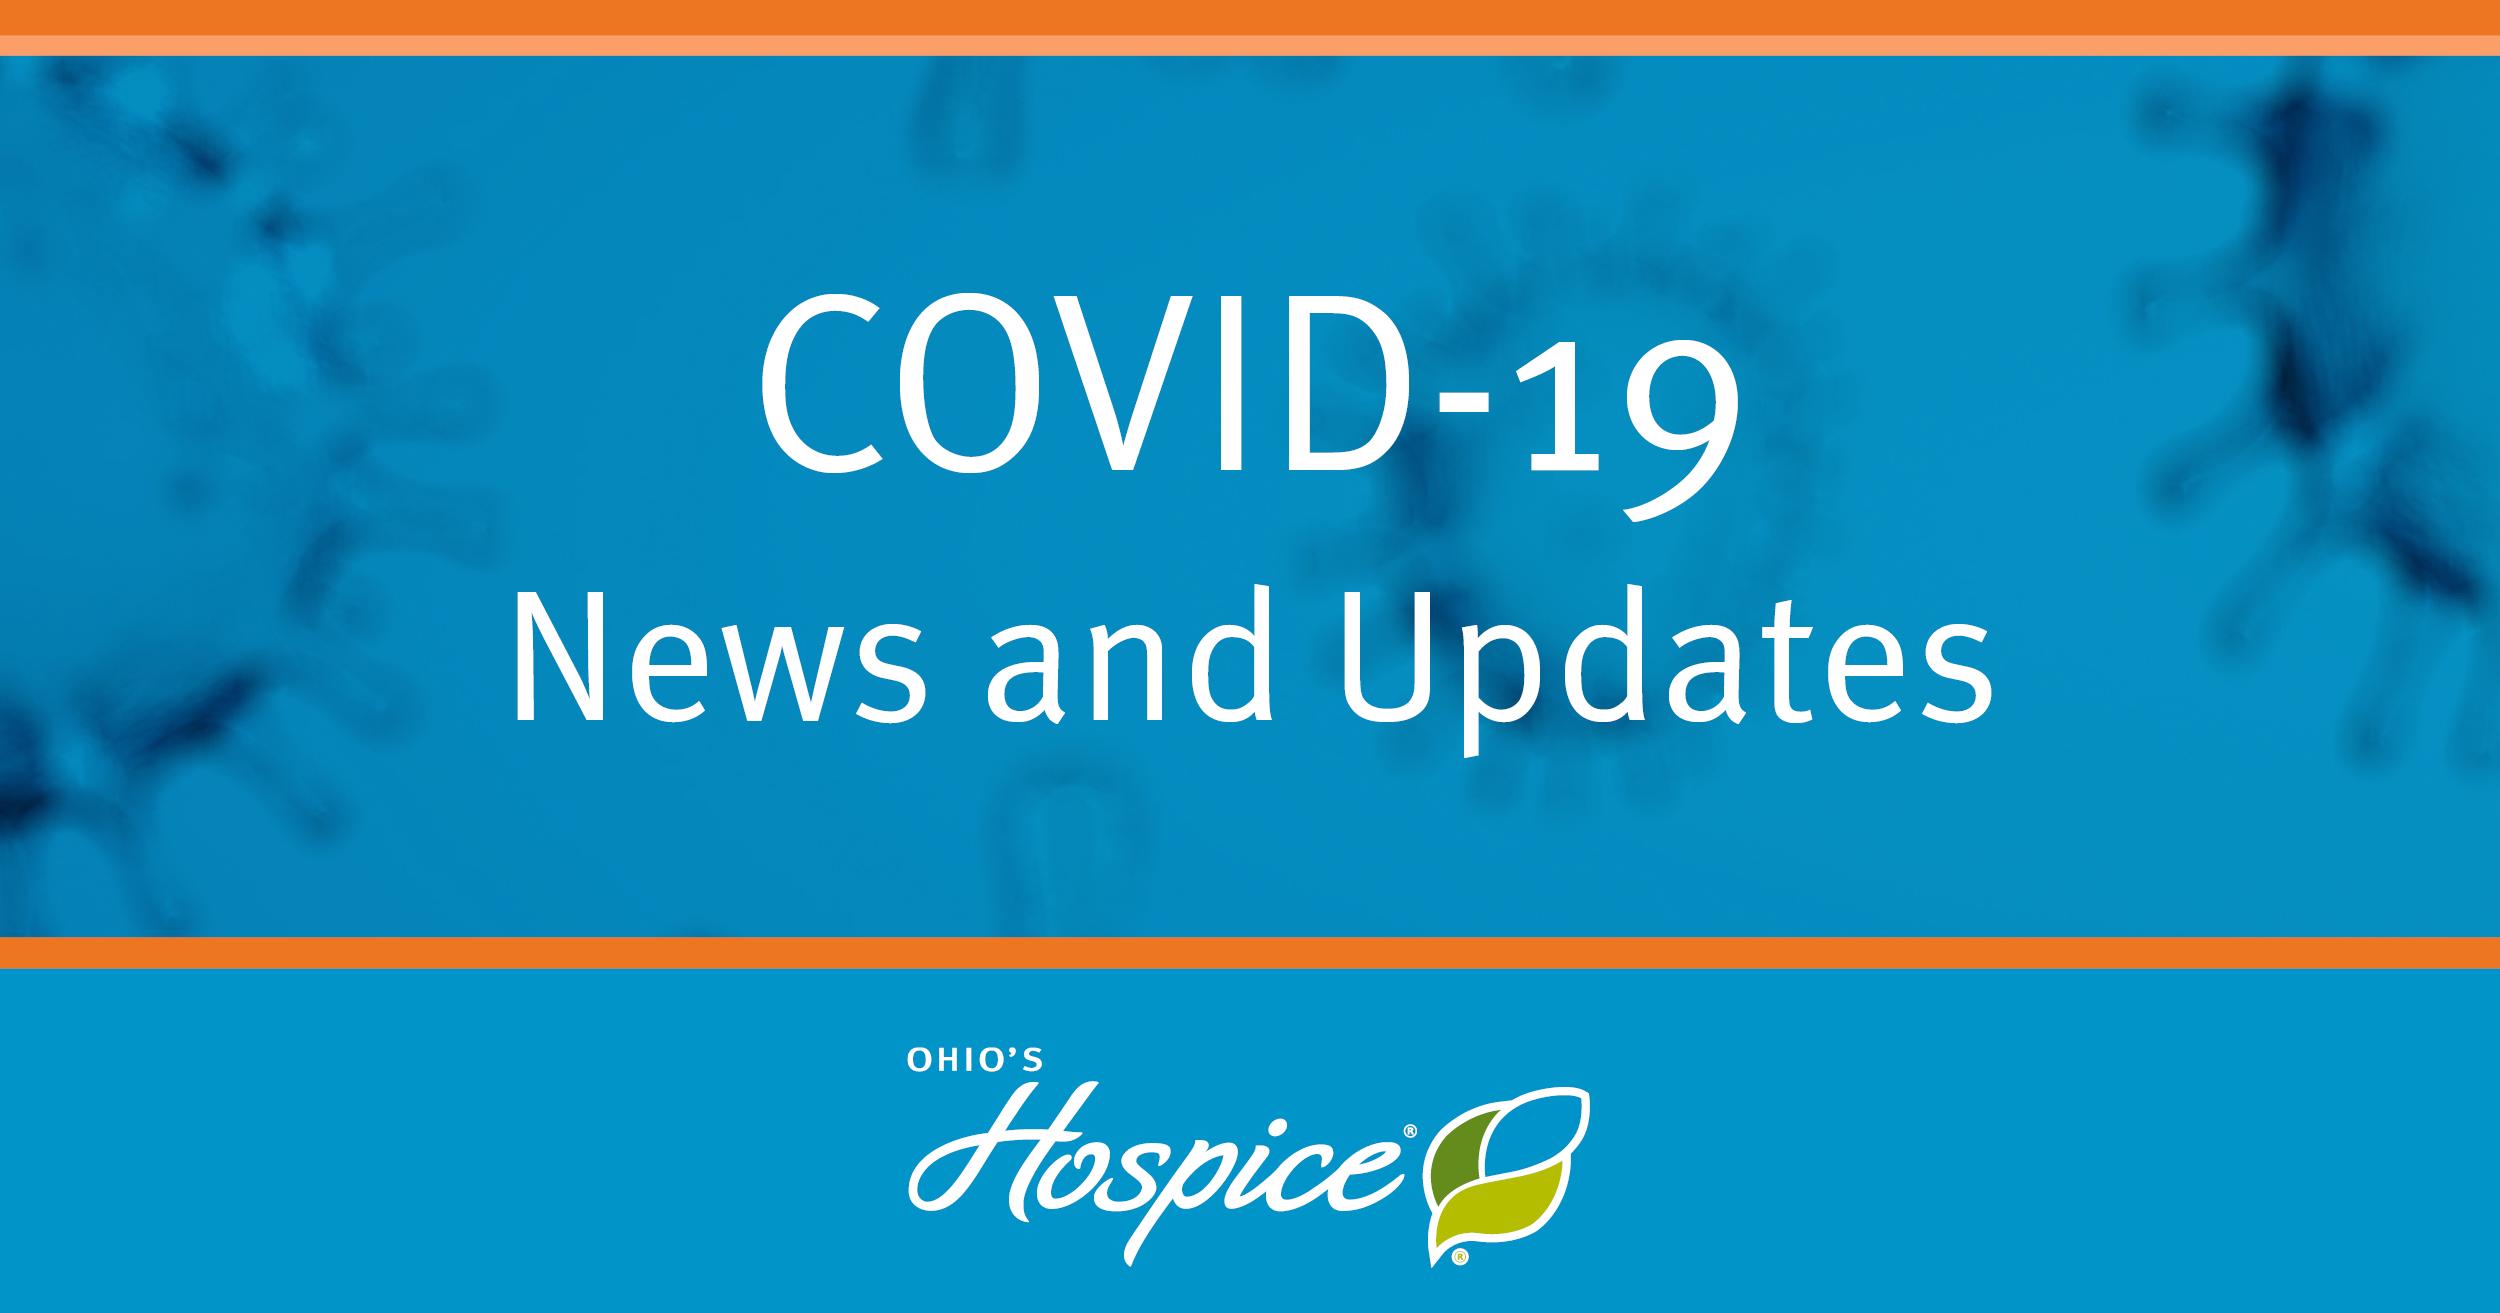 Ohio's Hospice COVID 19 Update